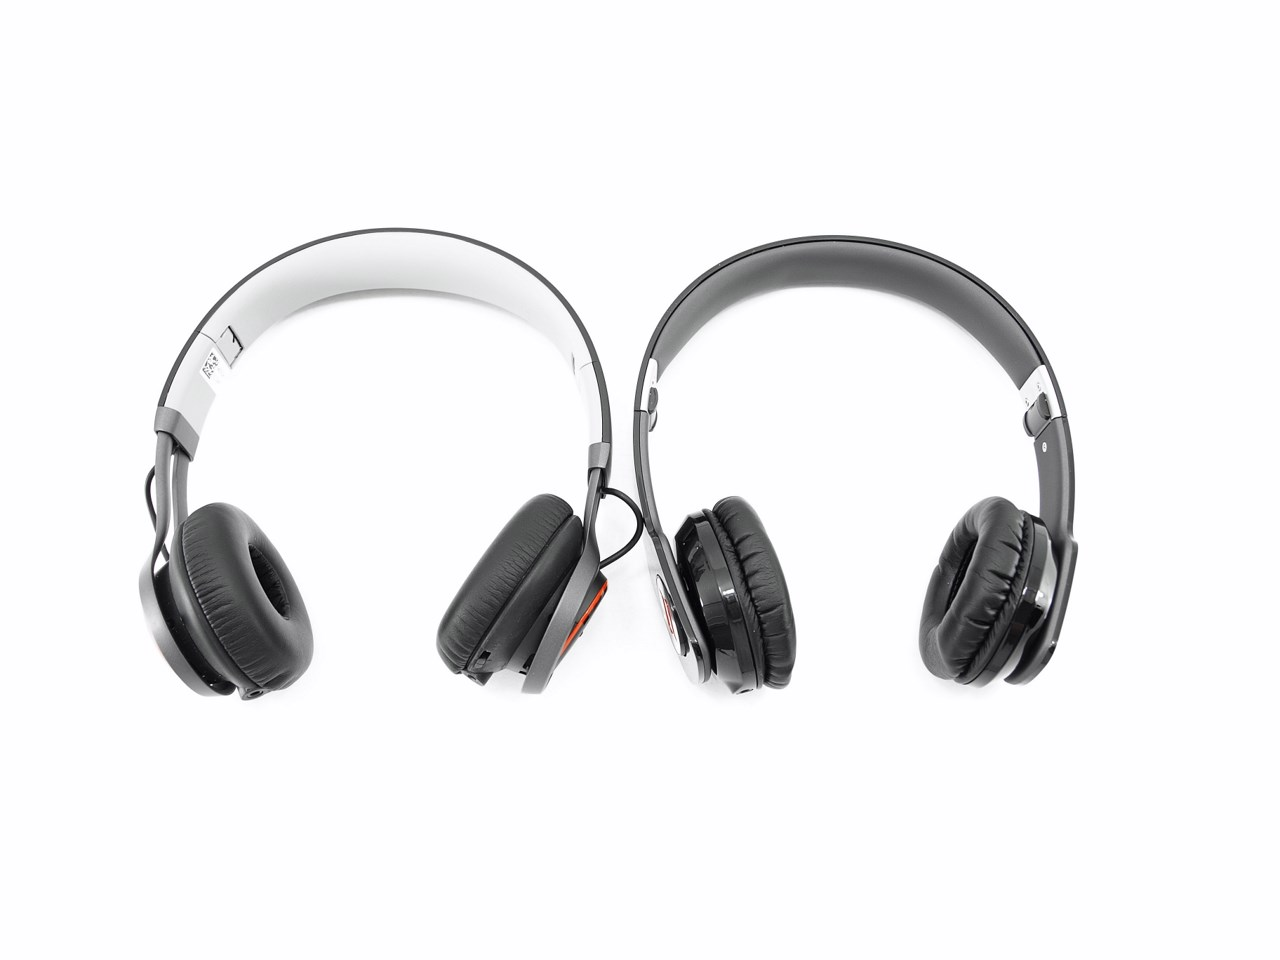 jabra wireless headphones instructions